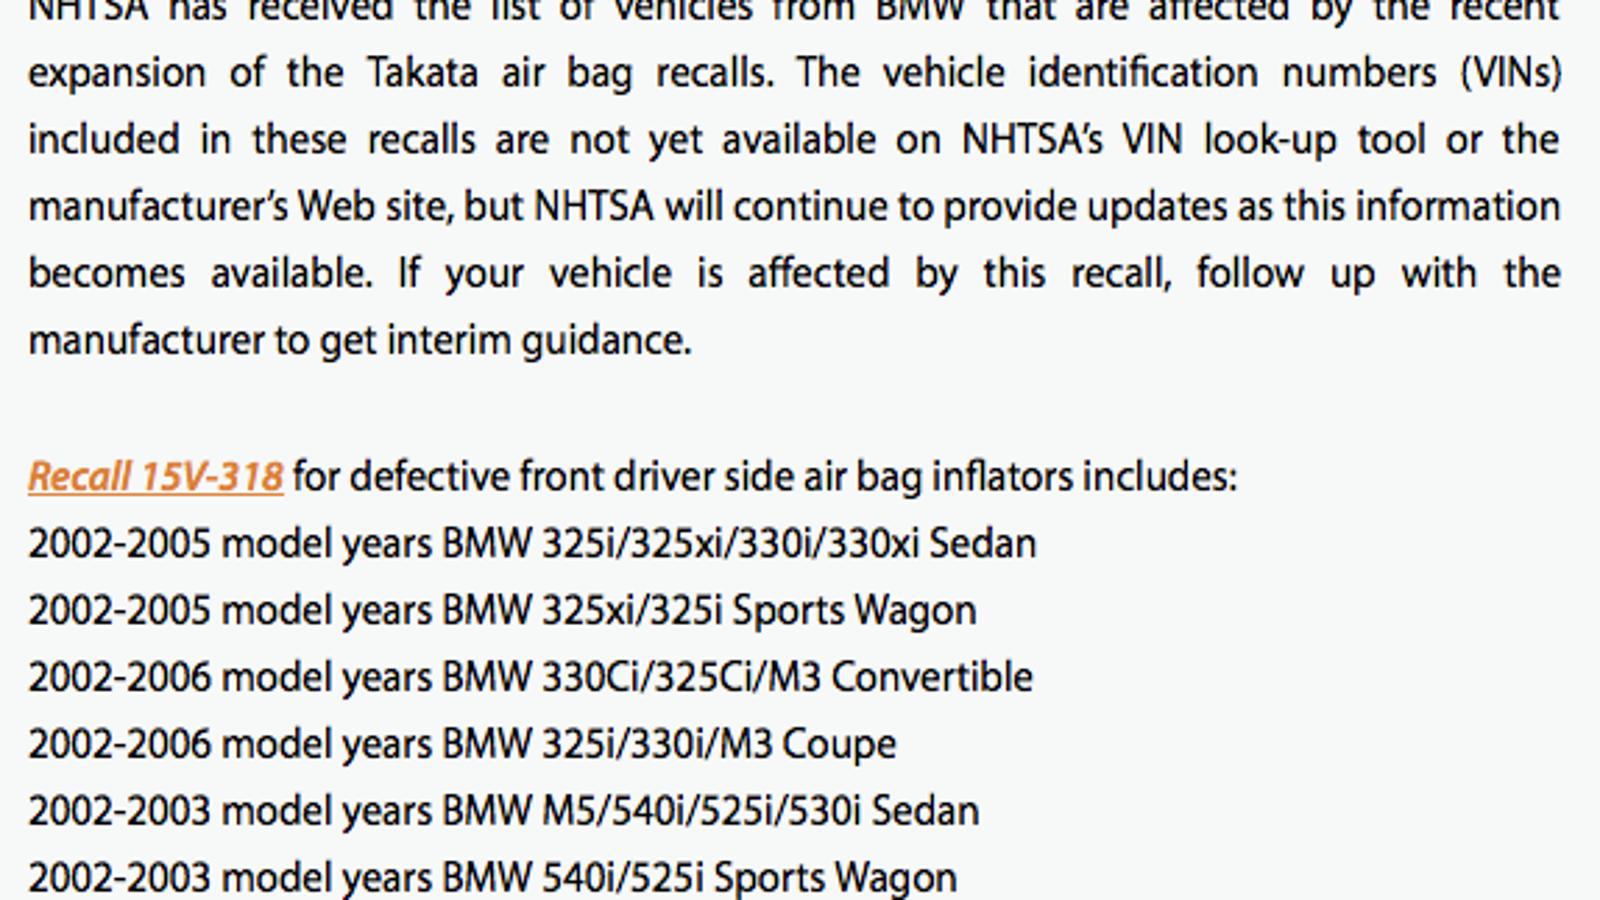 PSA: Takata recalls now affect many early 00s BMWs (e39, e46